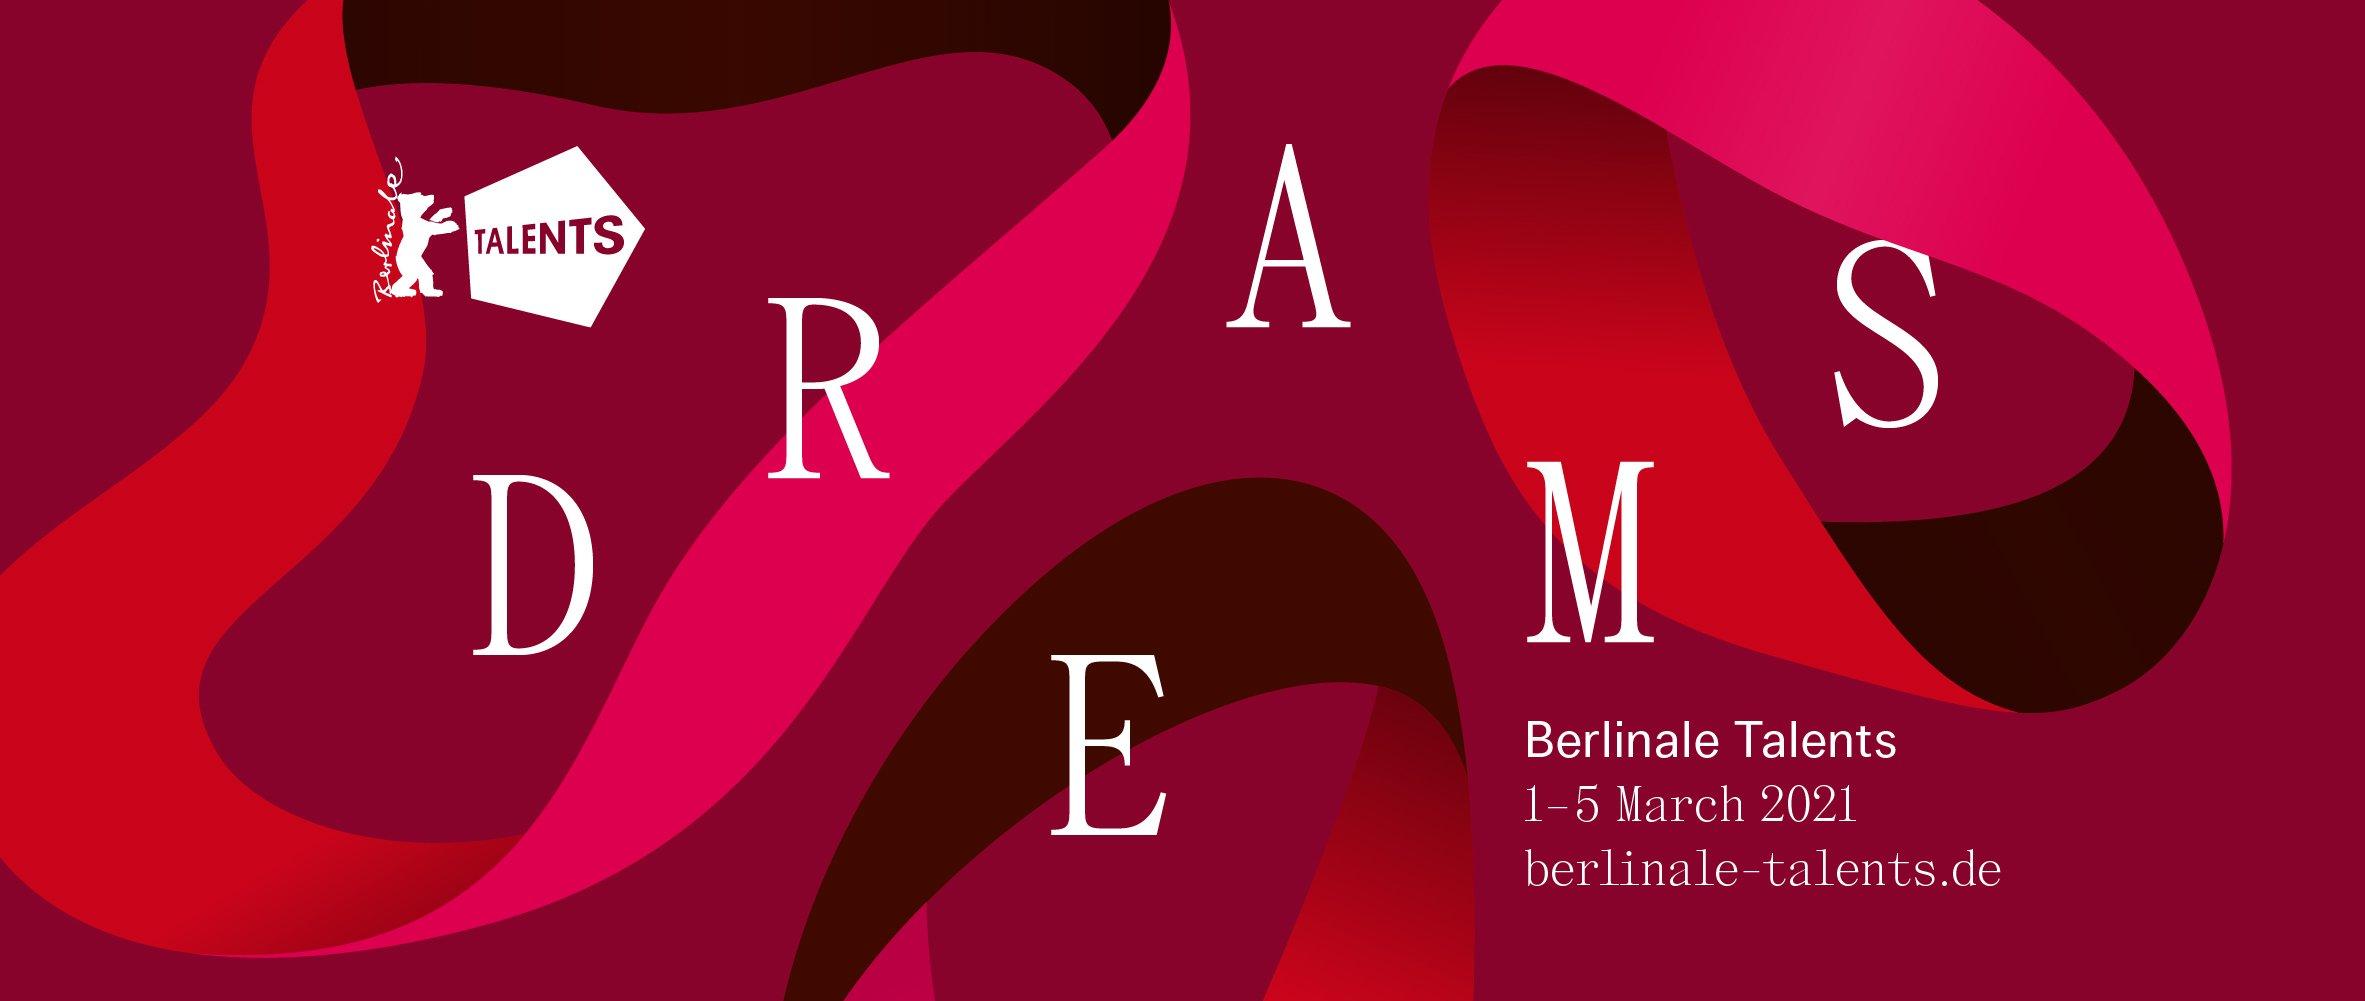 berlinale-talents-header-breed